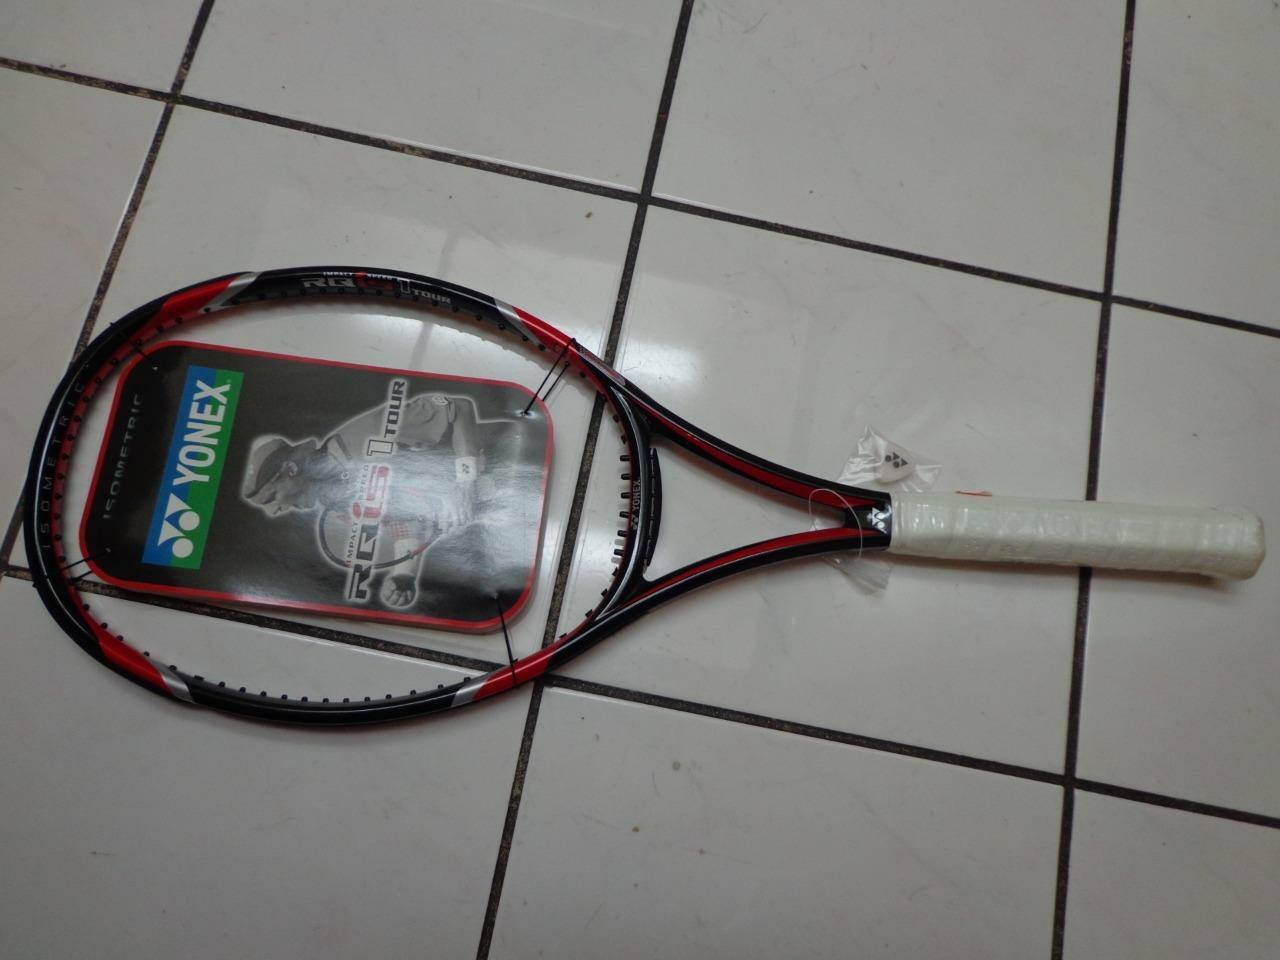 Nuevo Yonex Rq es 1 Tour 95 Head 16x18 4 5 8 Grip 295 gramos de tenis raqueta